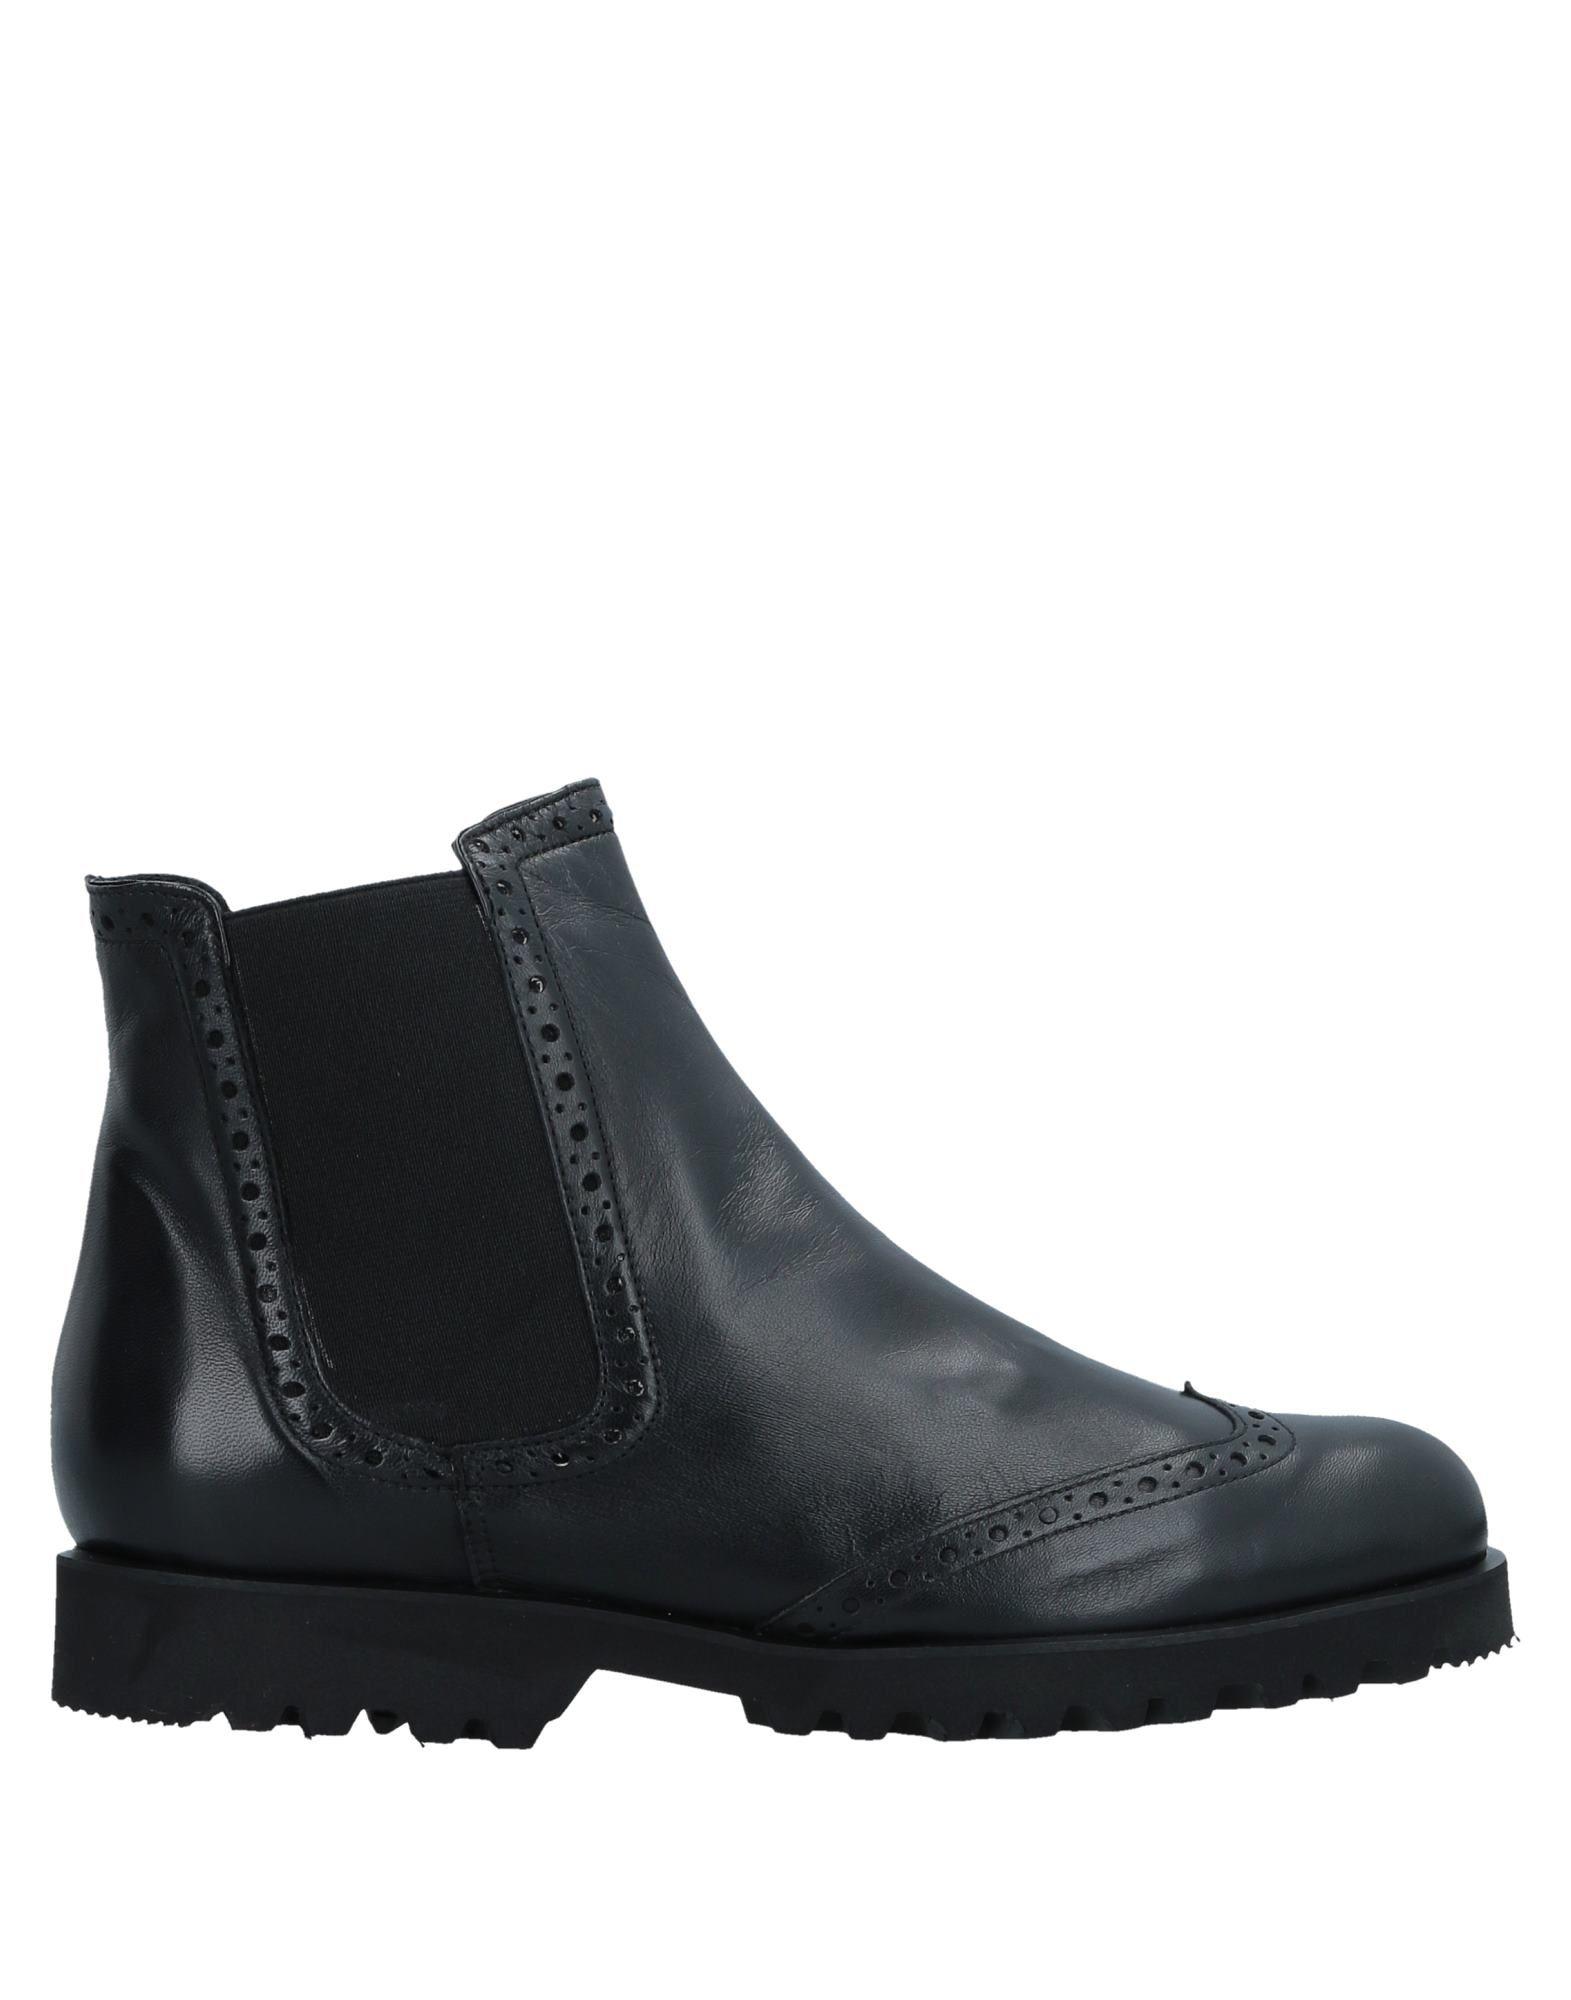 Chelsea Boots Cantarelli Donna Donna Cantarelli - 11516826TV cca885